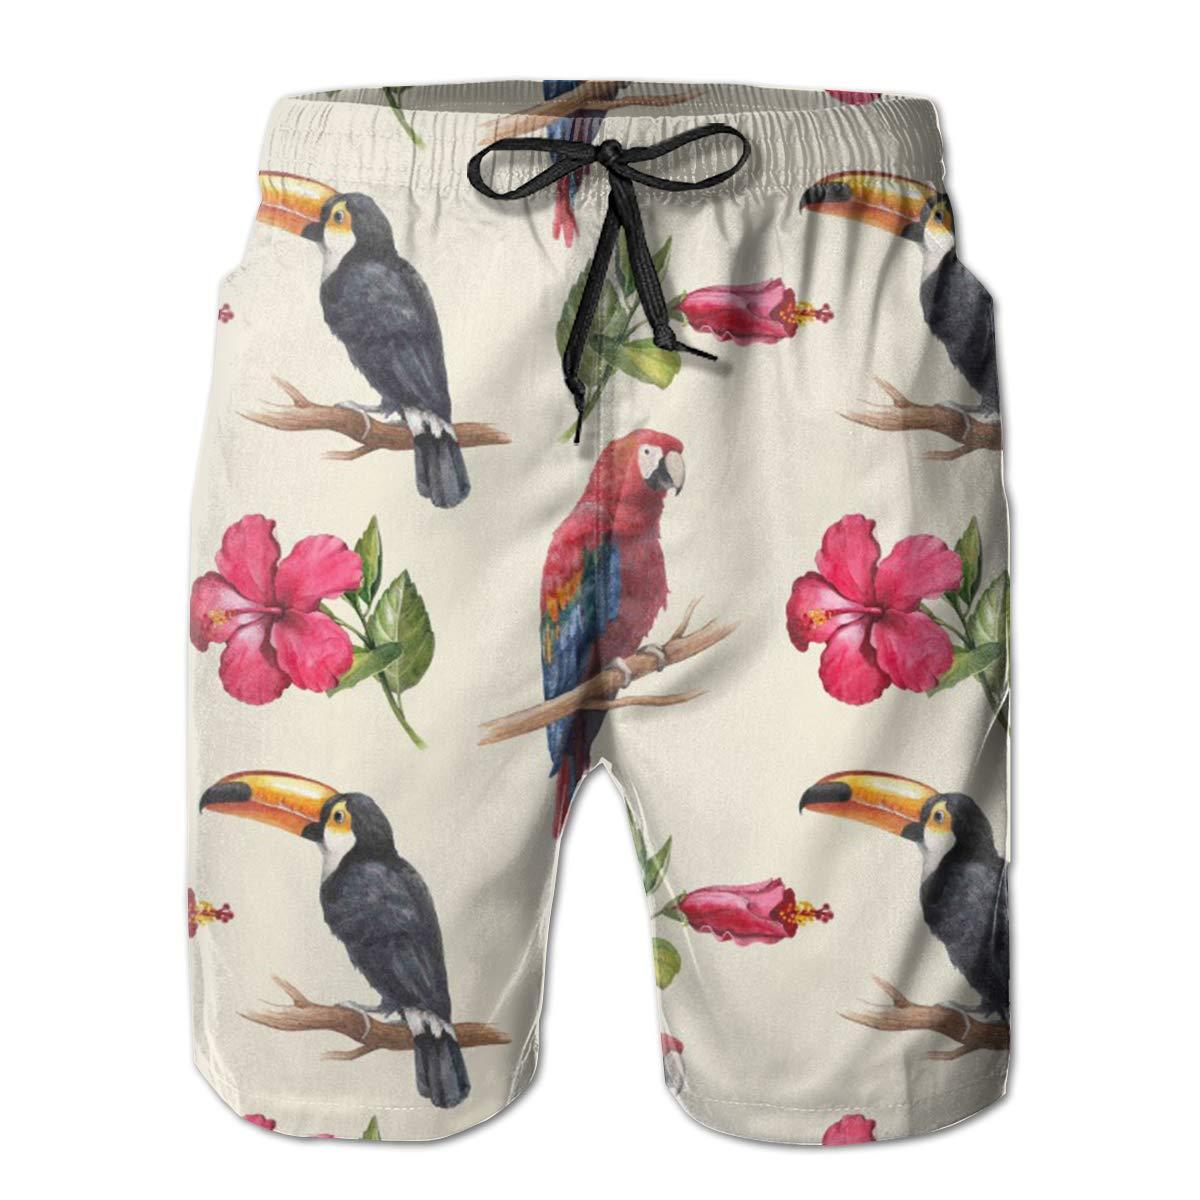 Eofjbg Fashion Mens Tucano Beach Shorts Board Shorts Casual Shorts Swim Trunks